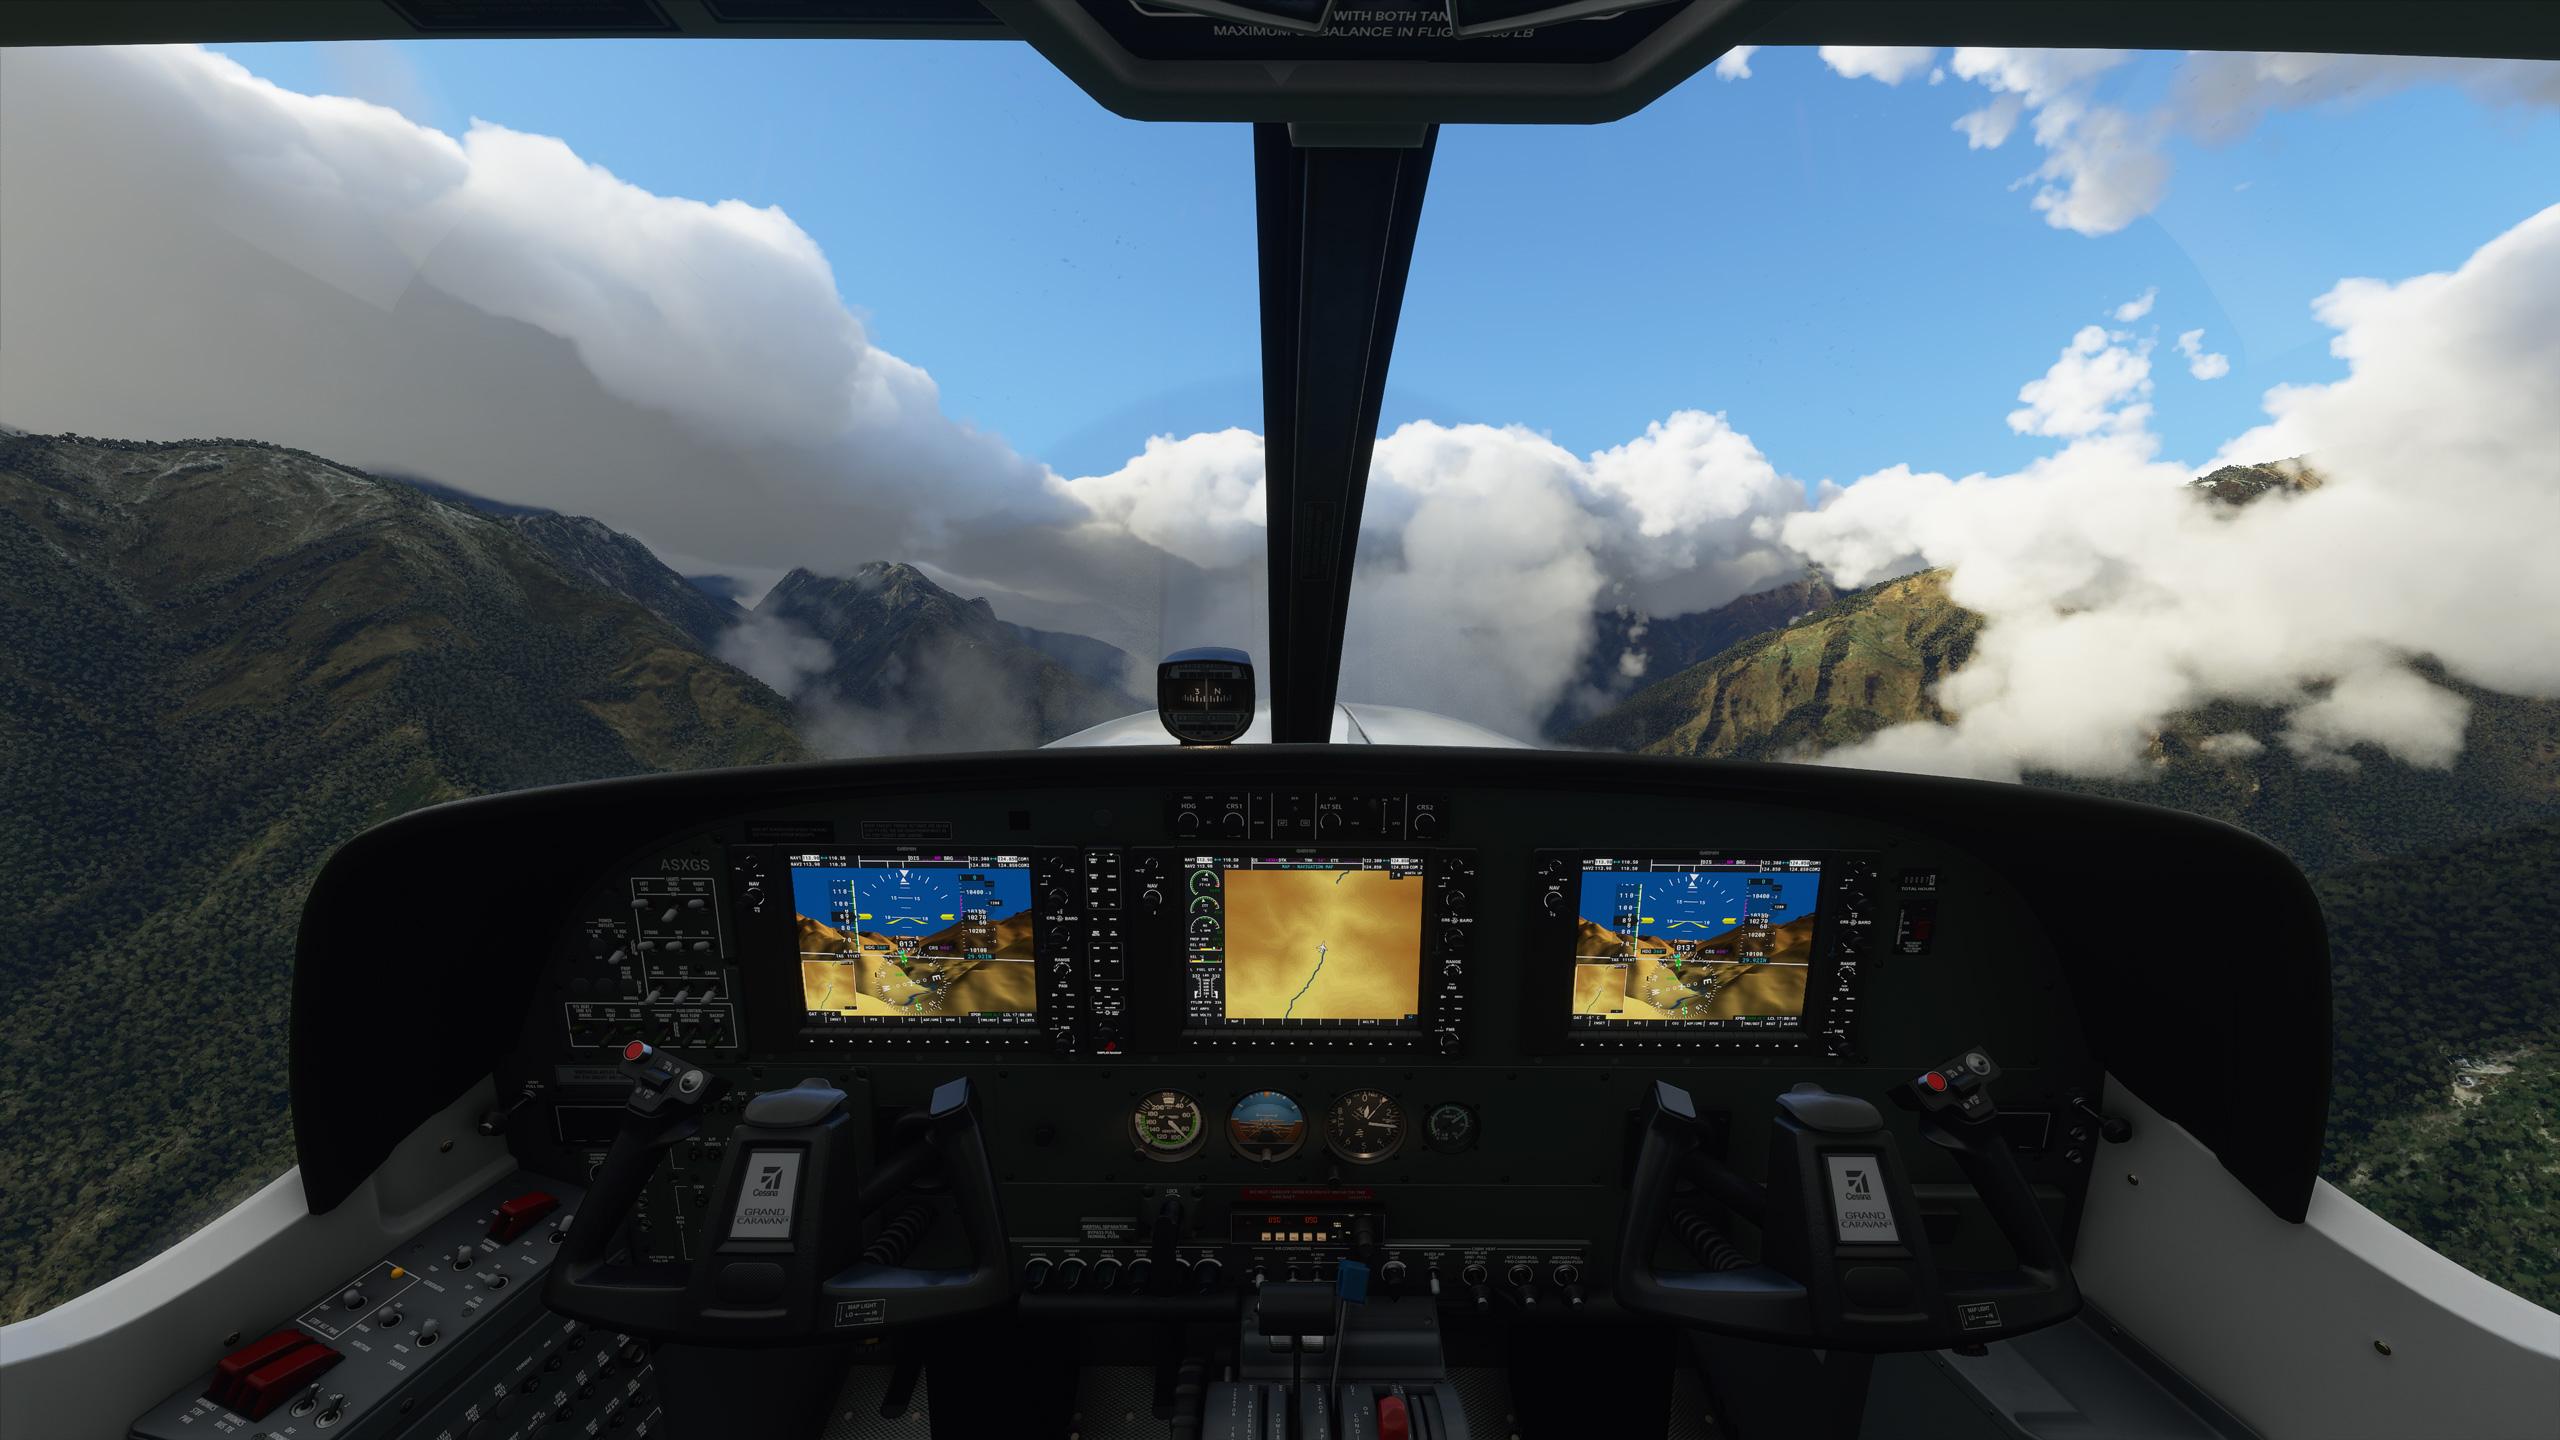 pop-out panels new windows microsoft flight simulator 2020